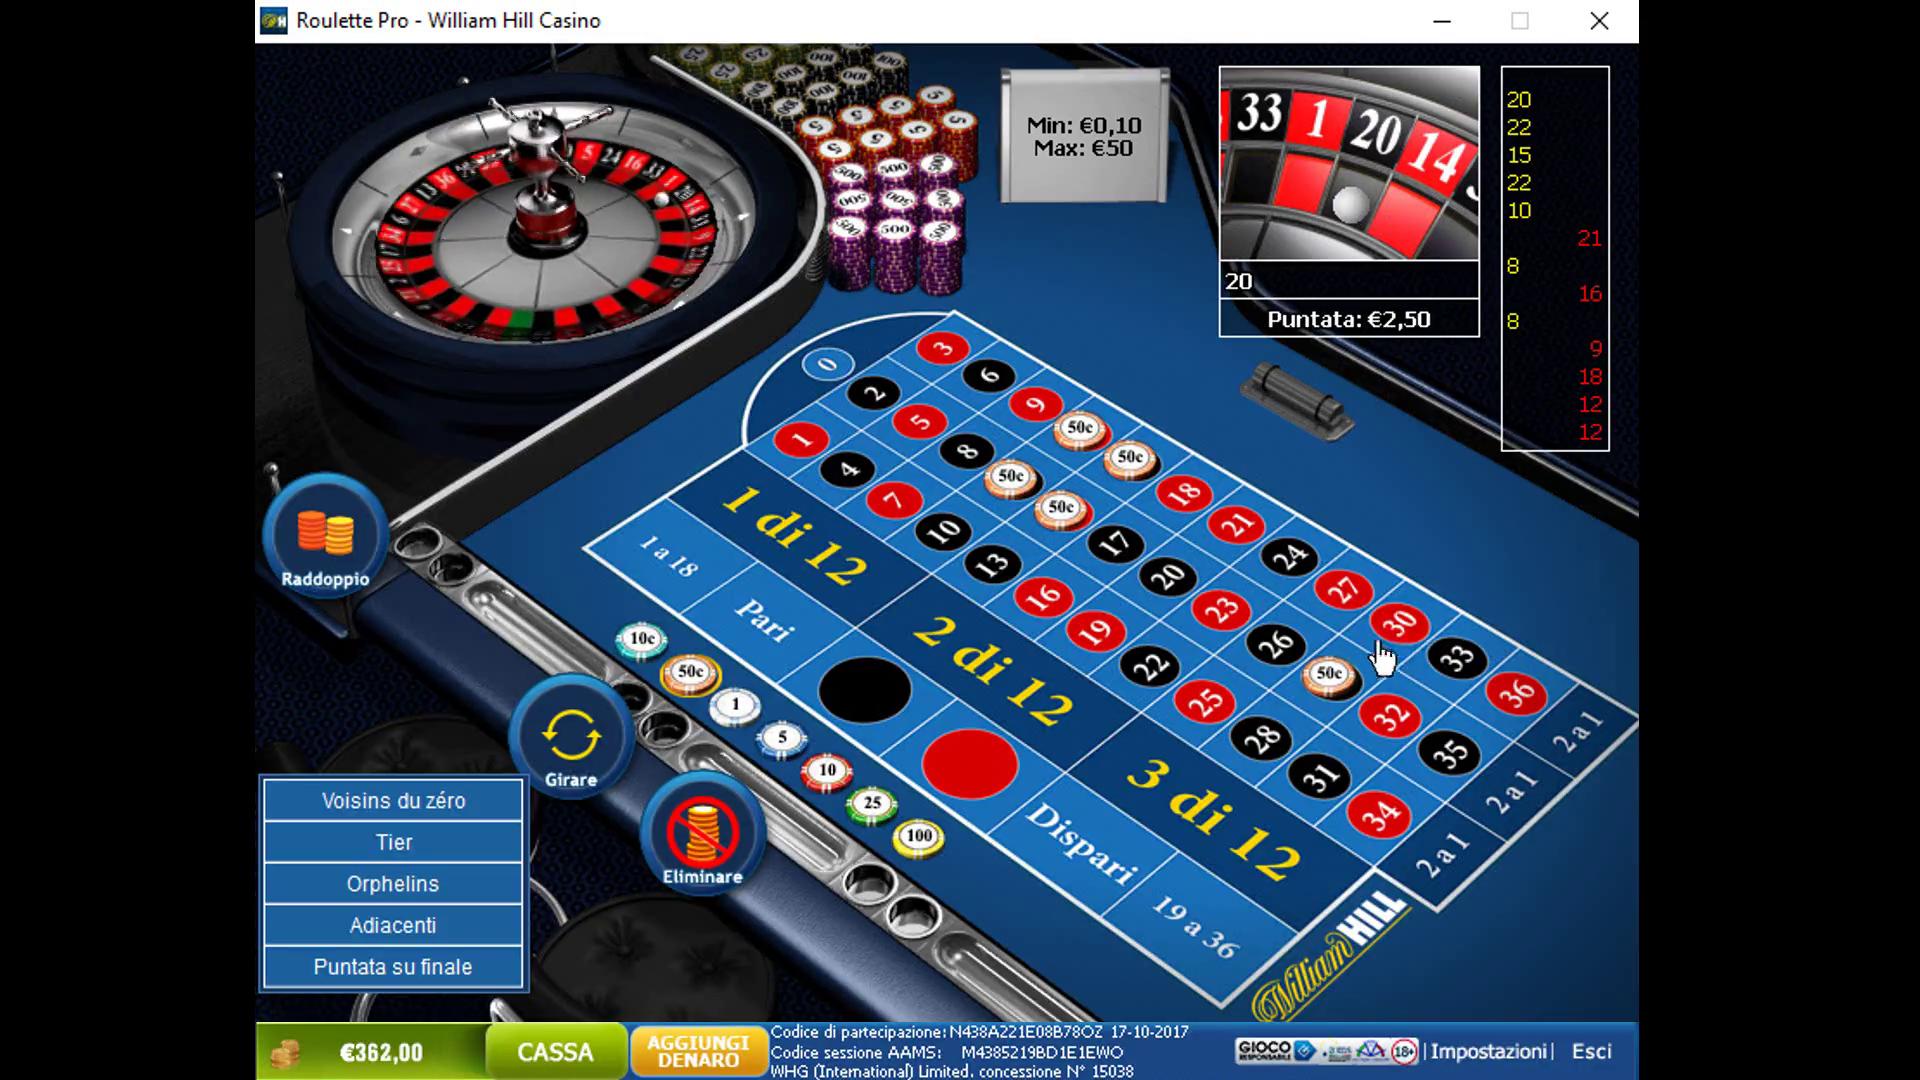 Metodo vincente roulette